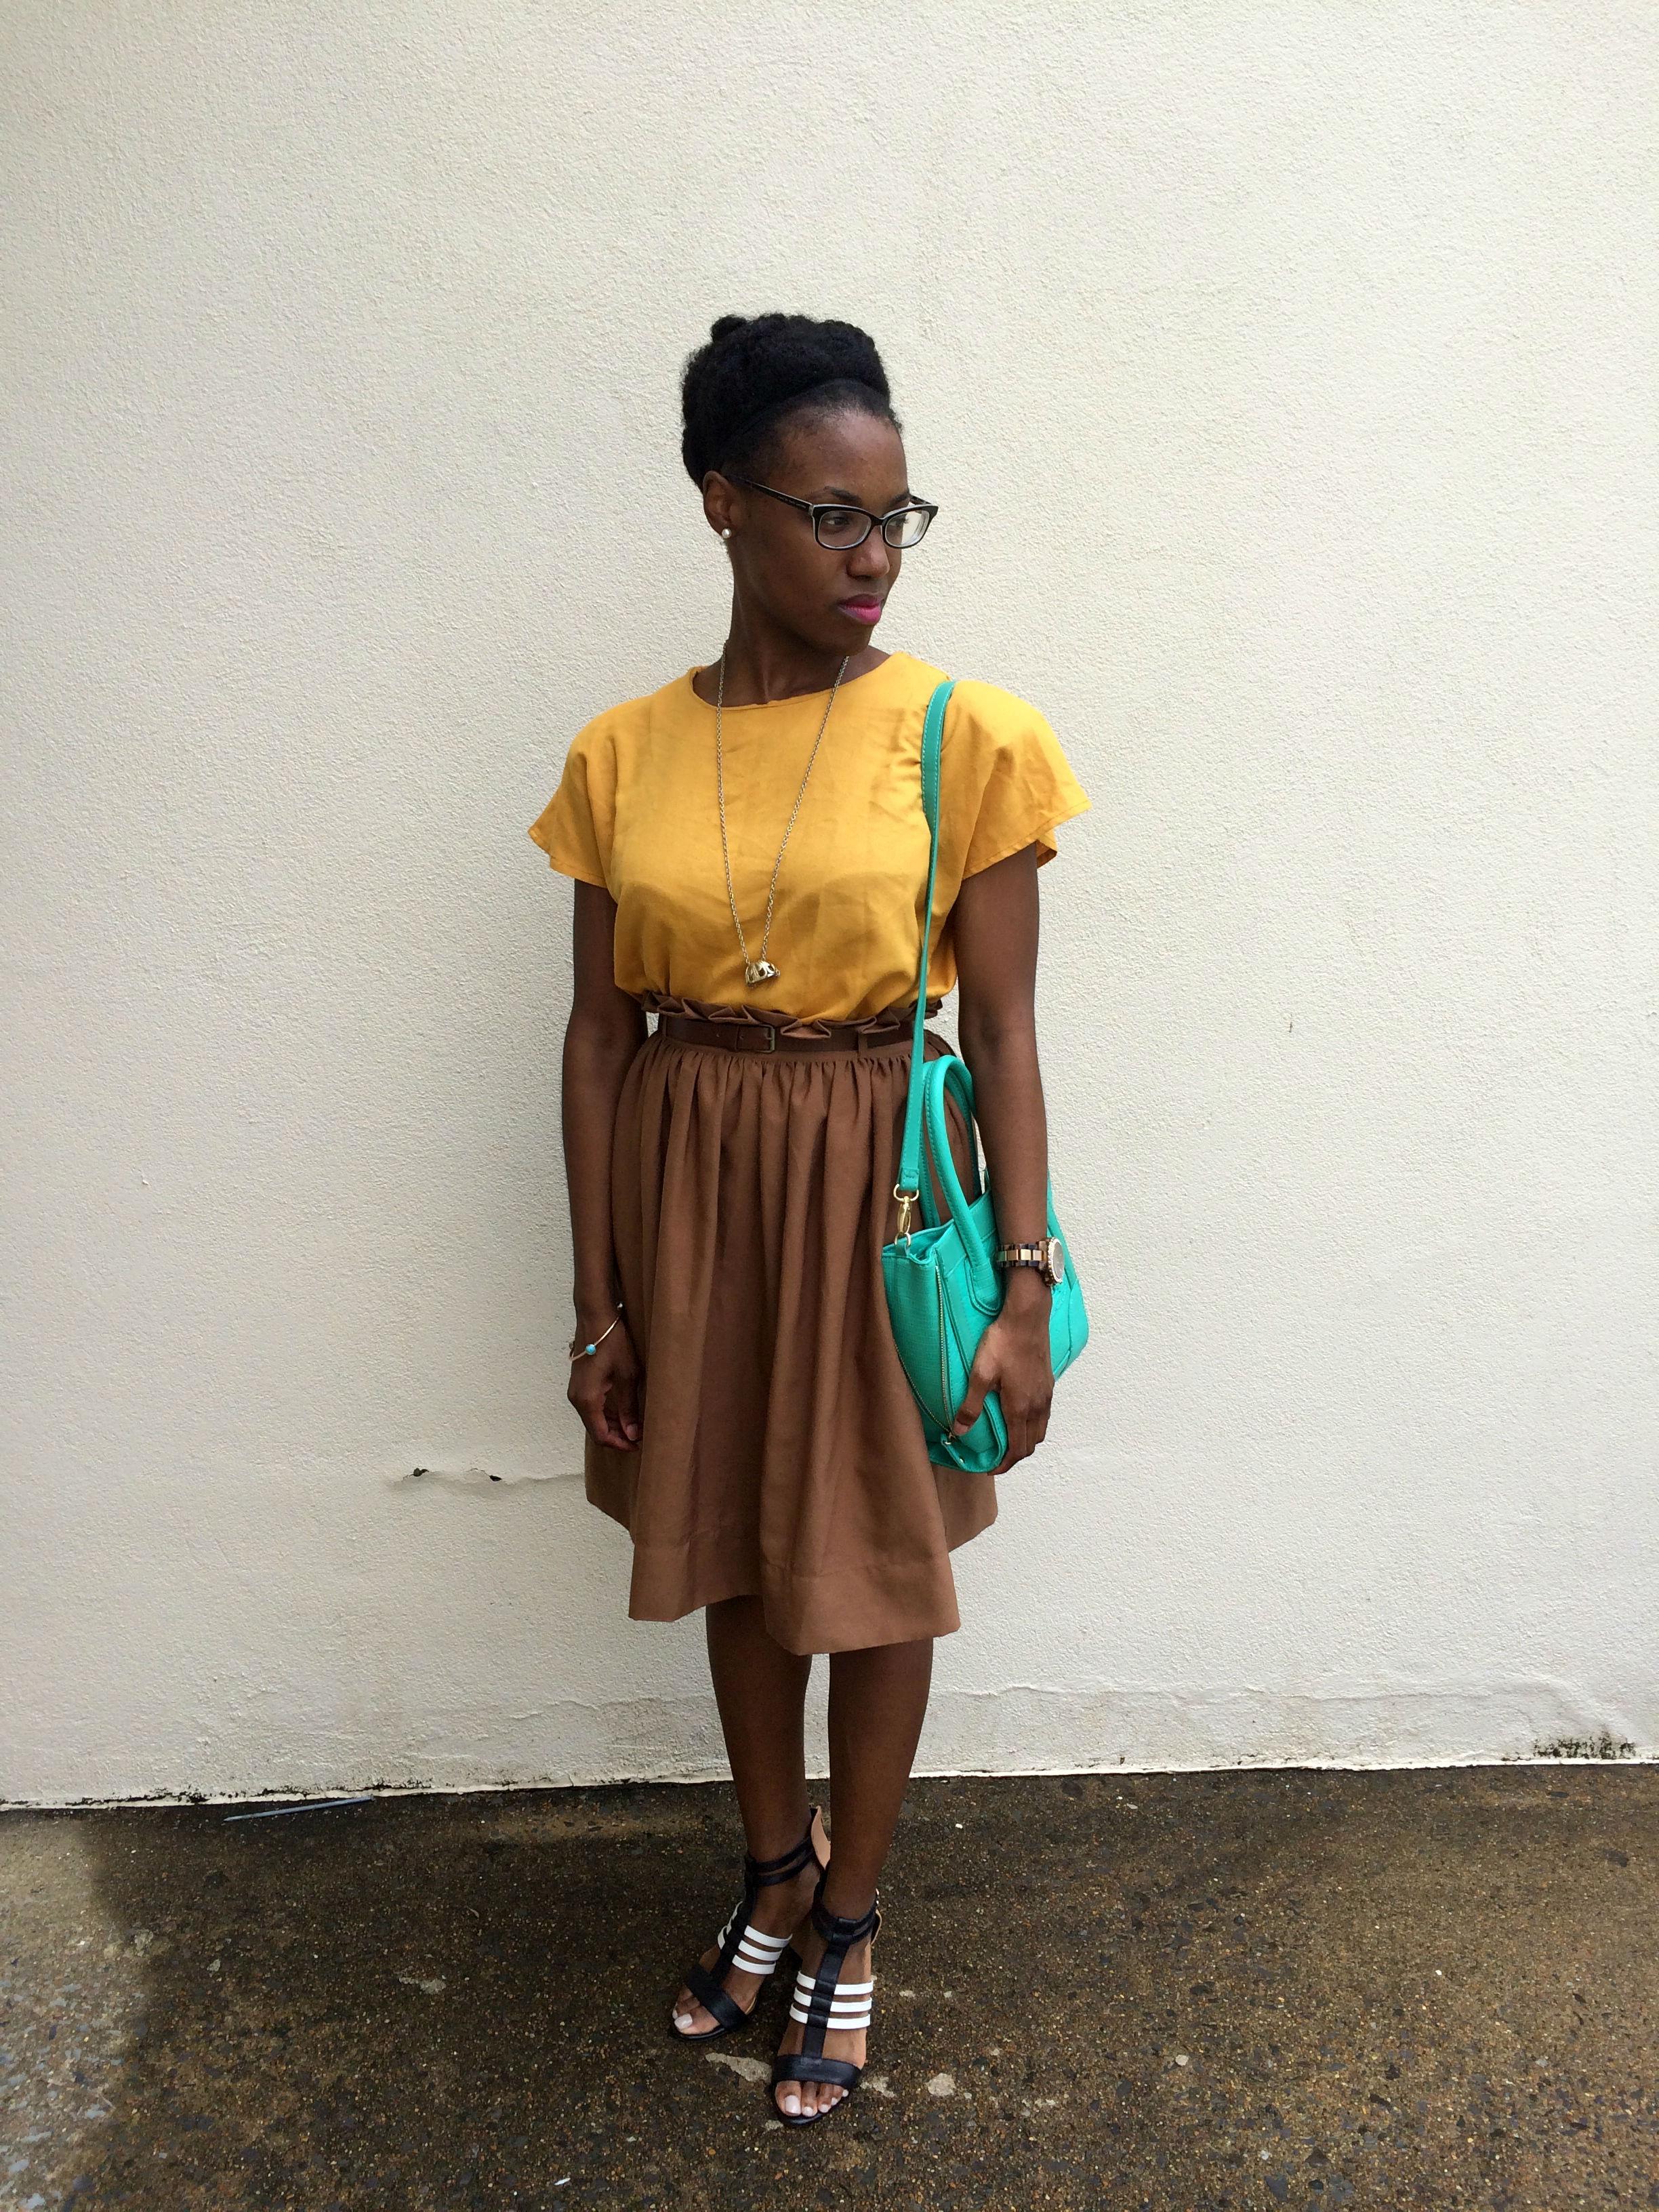 outfit details- shirt, bracelet and necklace: vintage; skirt: Forever 21; shoes: Jessica Simpson c/o Dillards; purse: Aldo; watch: Michael Kors